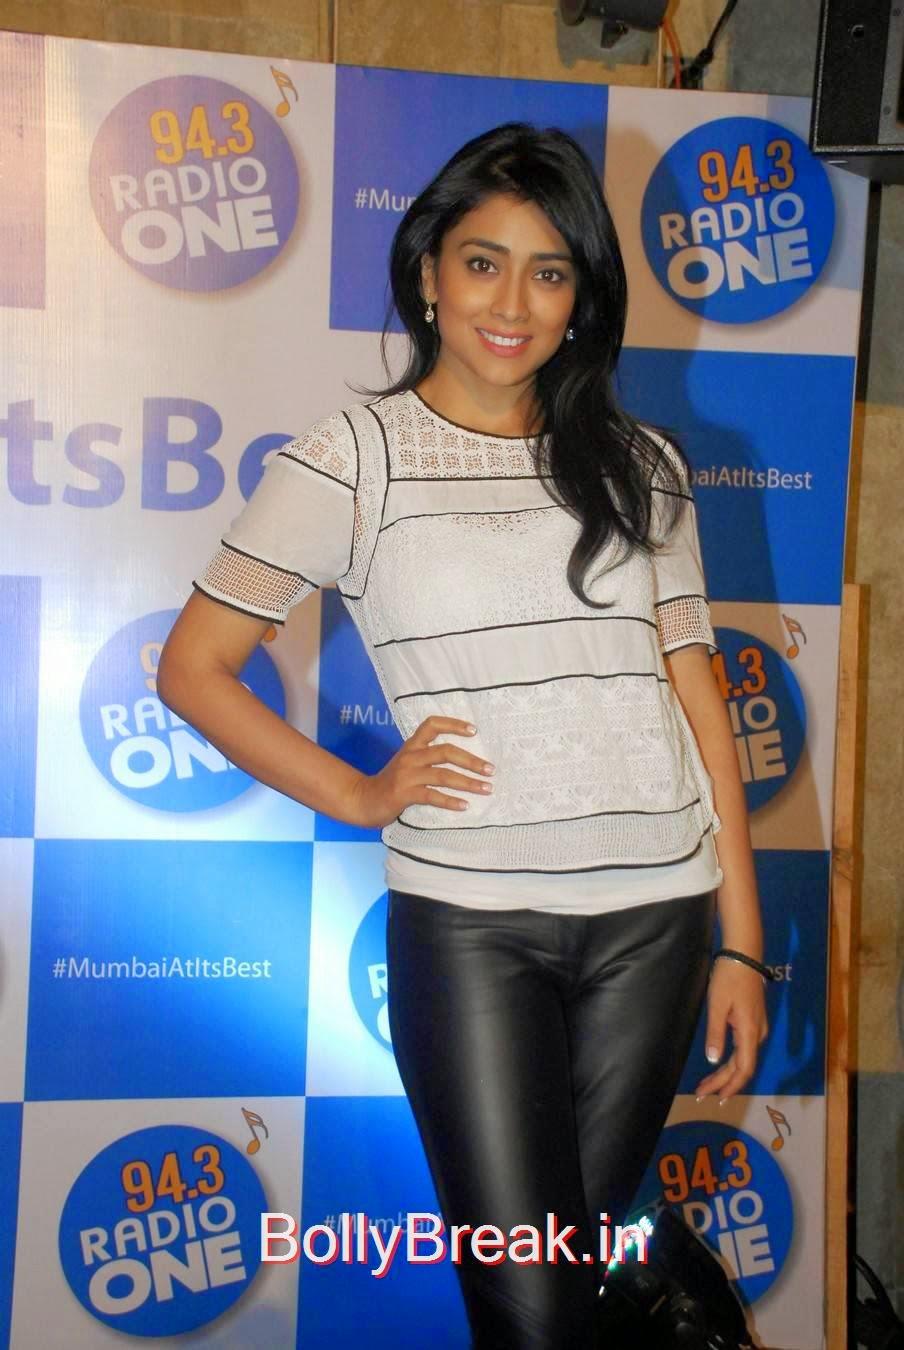 Shriya Saran Stills, Shriya Saran Hot Pics in Black Tight Leggings & Top at event